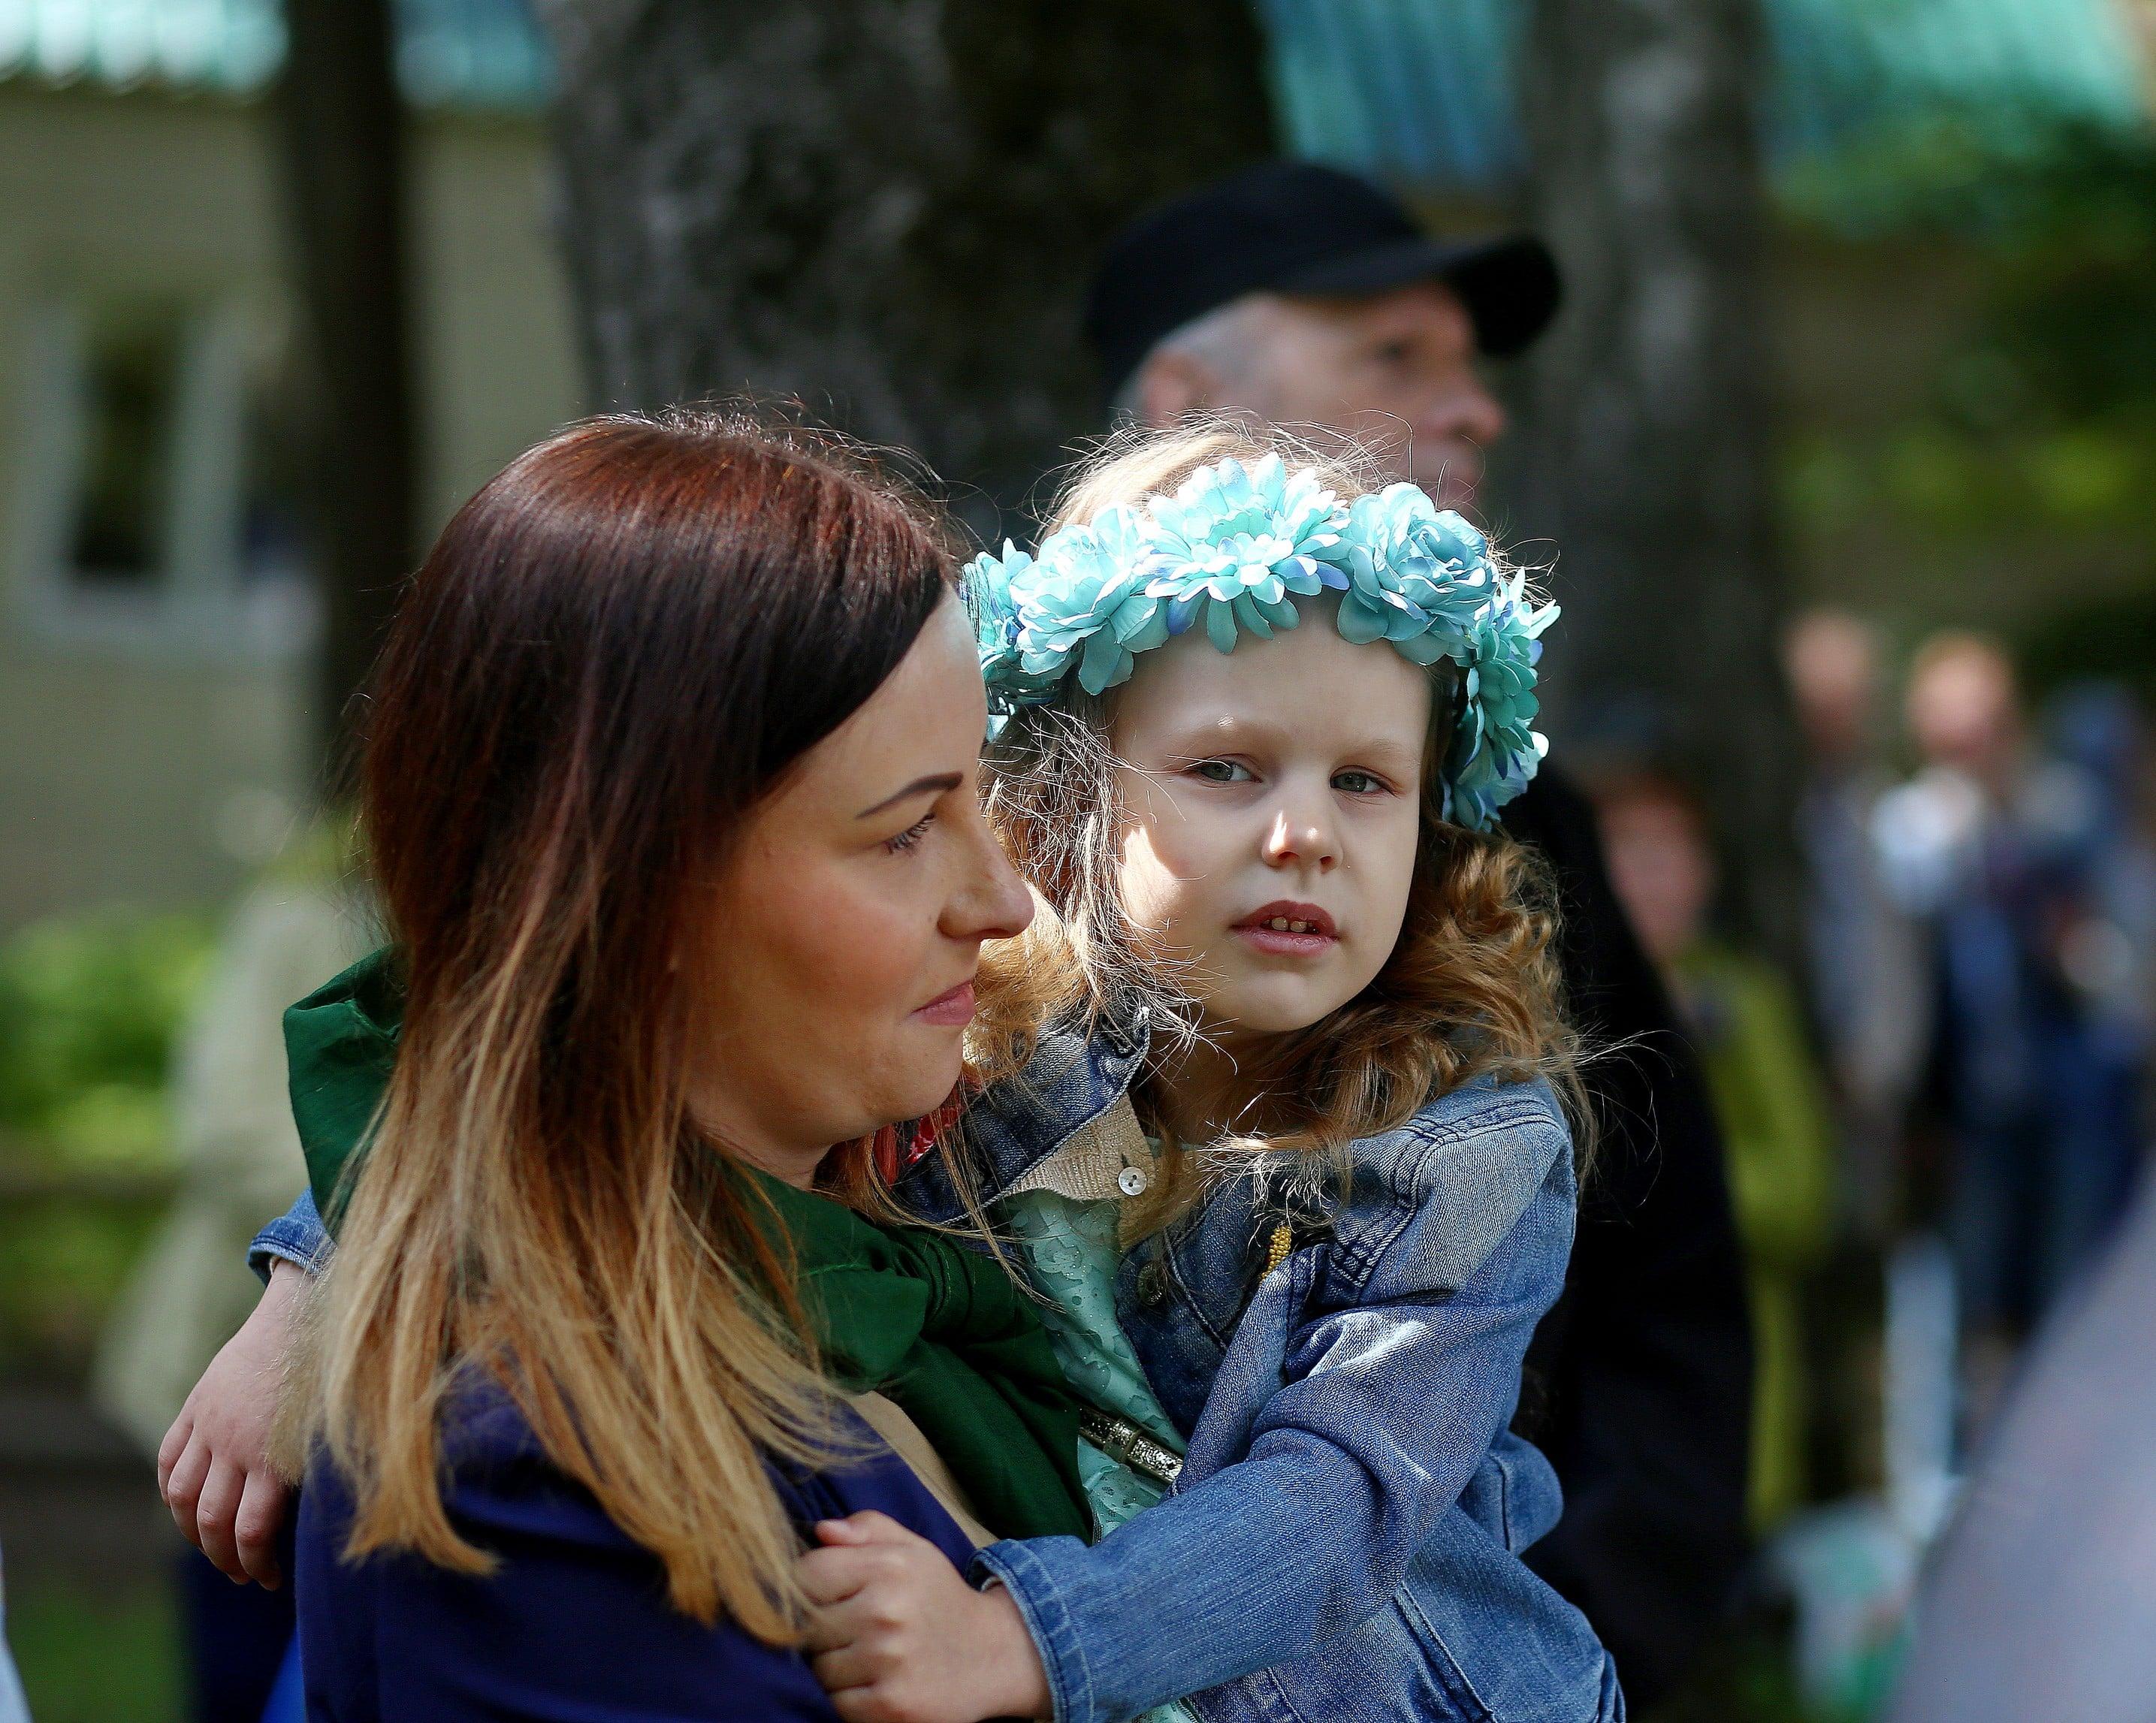 http://monuspen.ru/photoreports/14b72a43bf568736ebc953d1a903f329.jpg